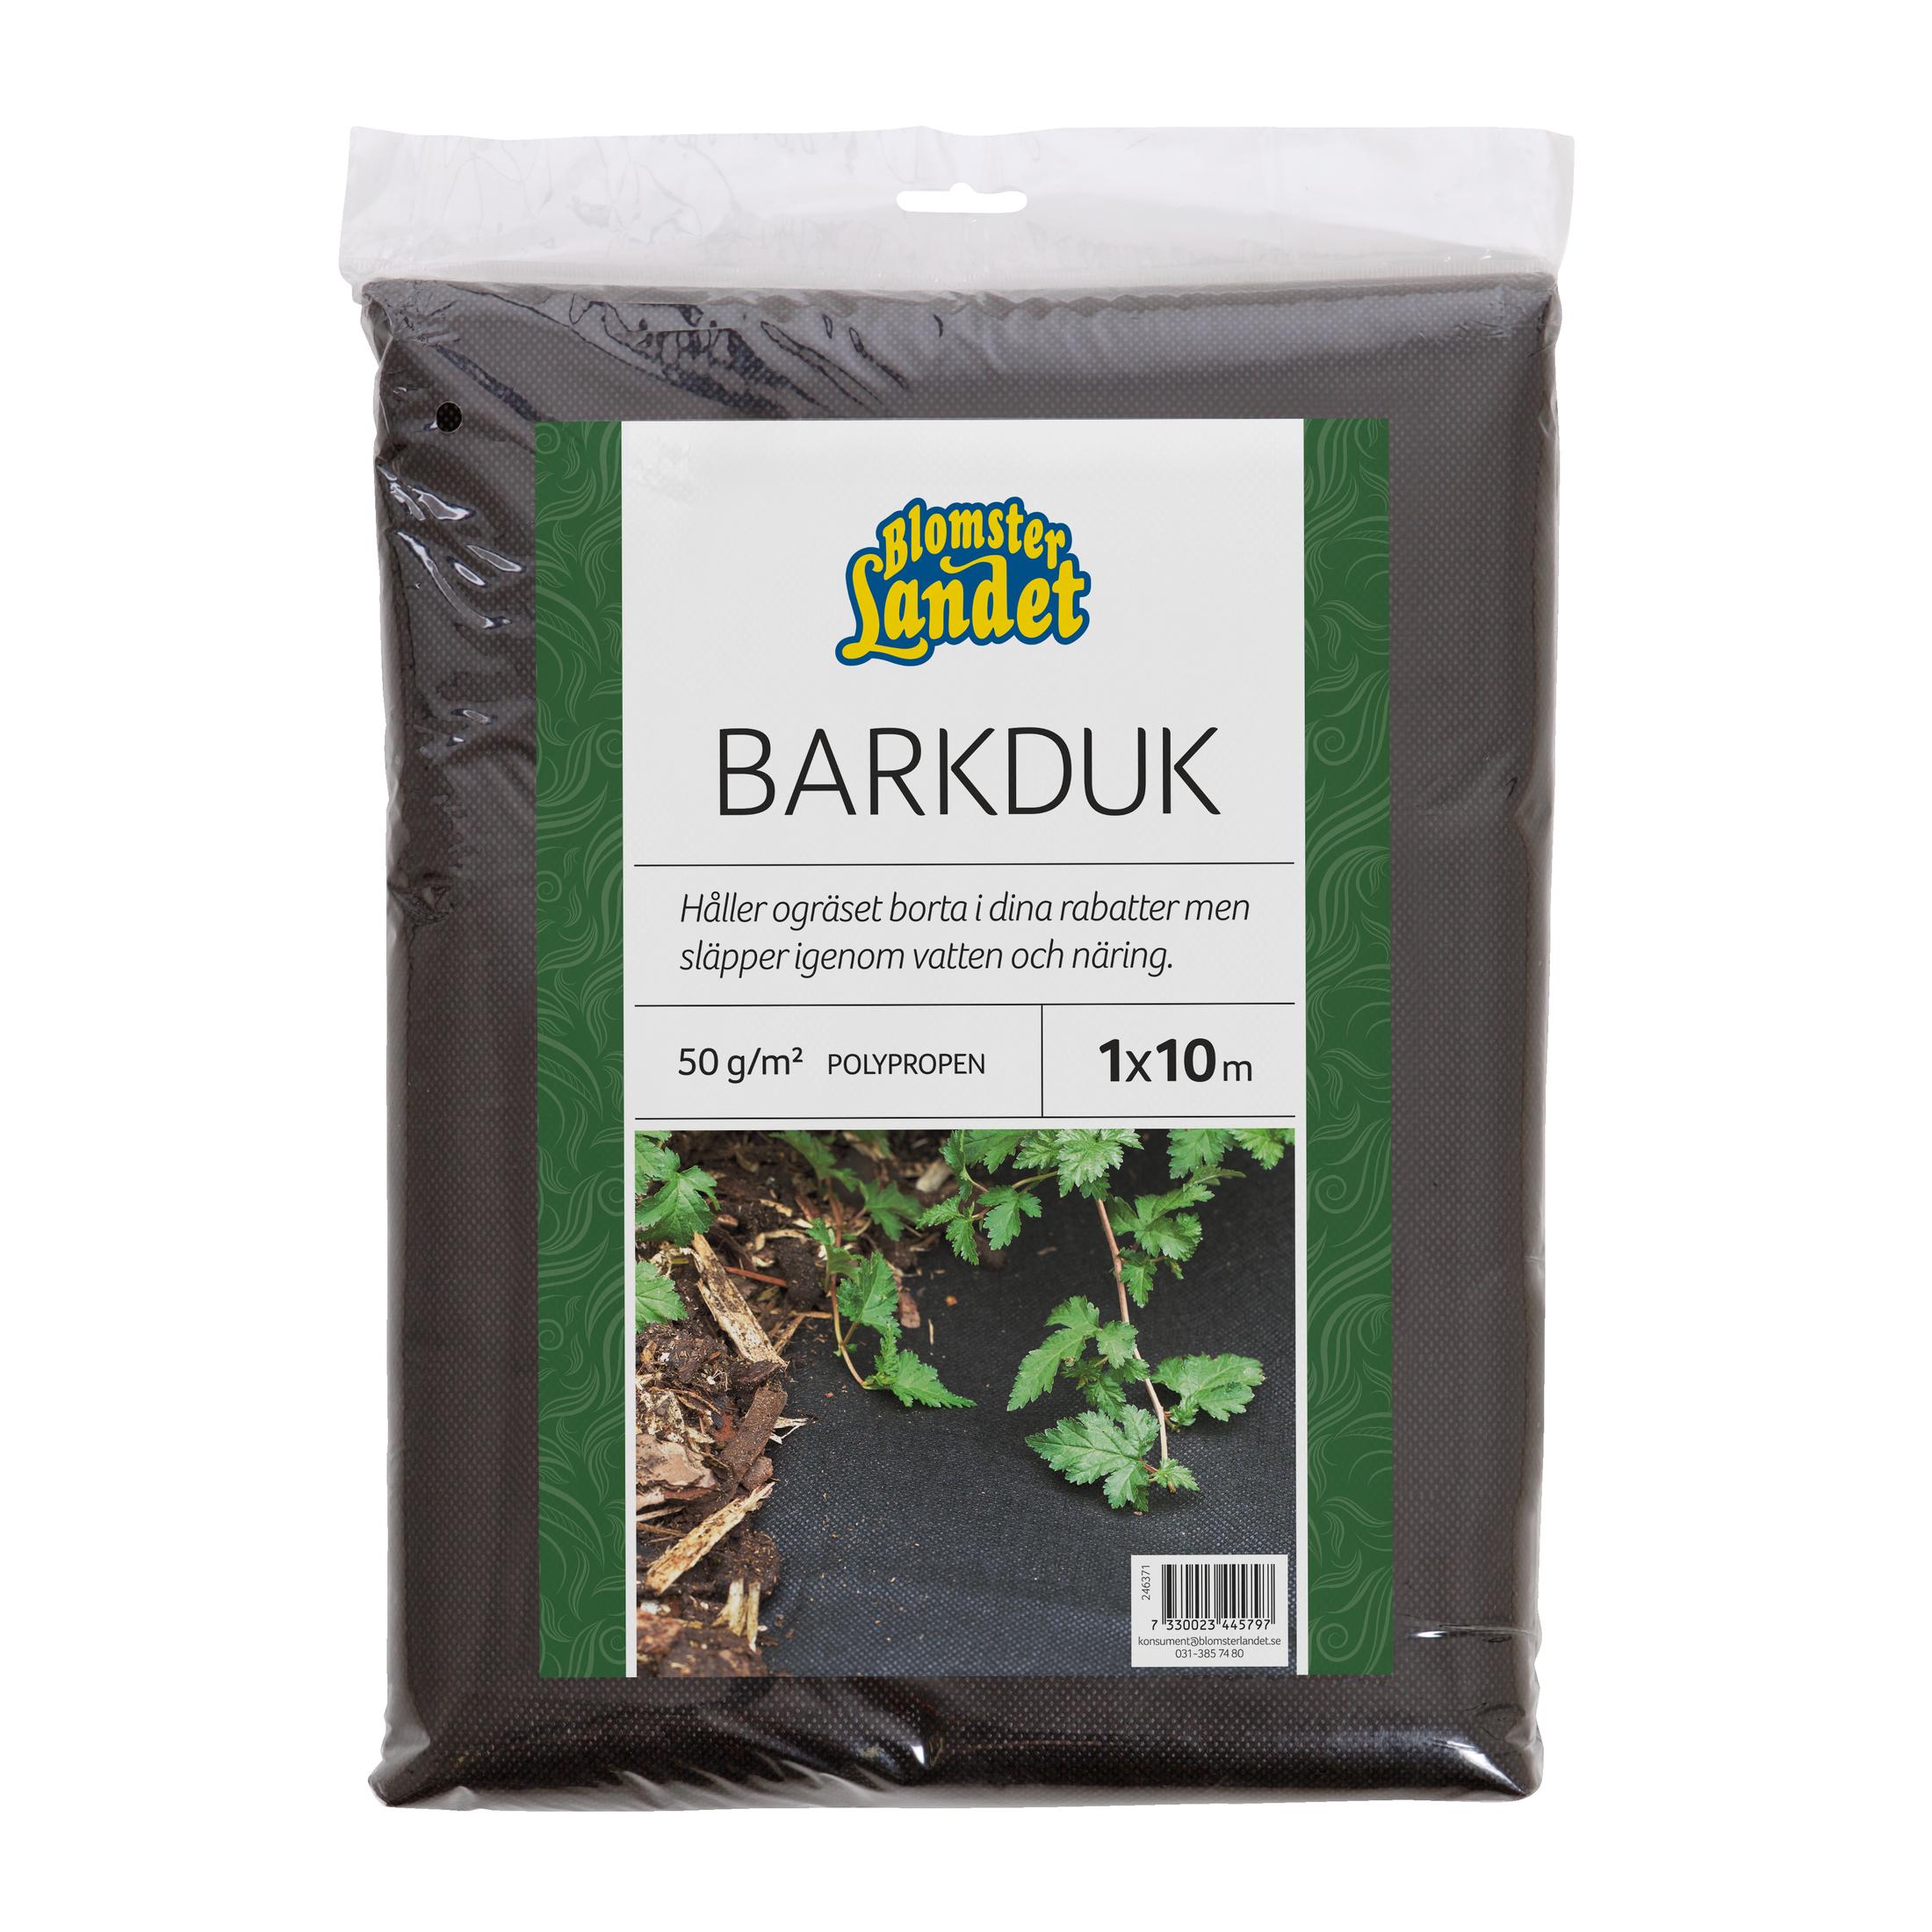 Produktbild på Barkduk Blomsterlandet